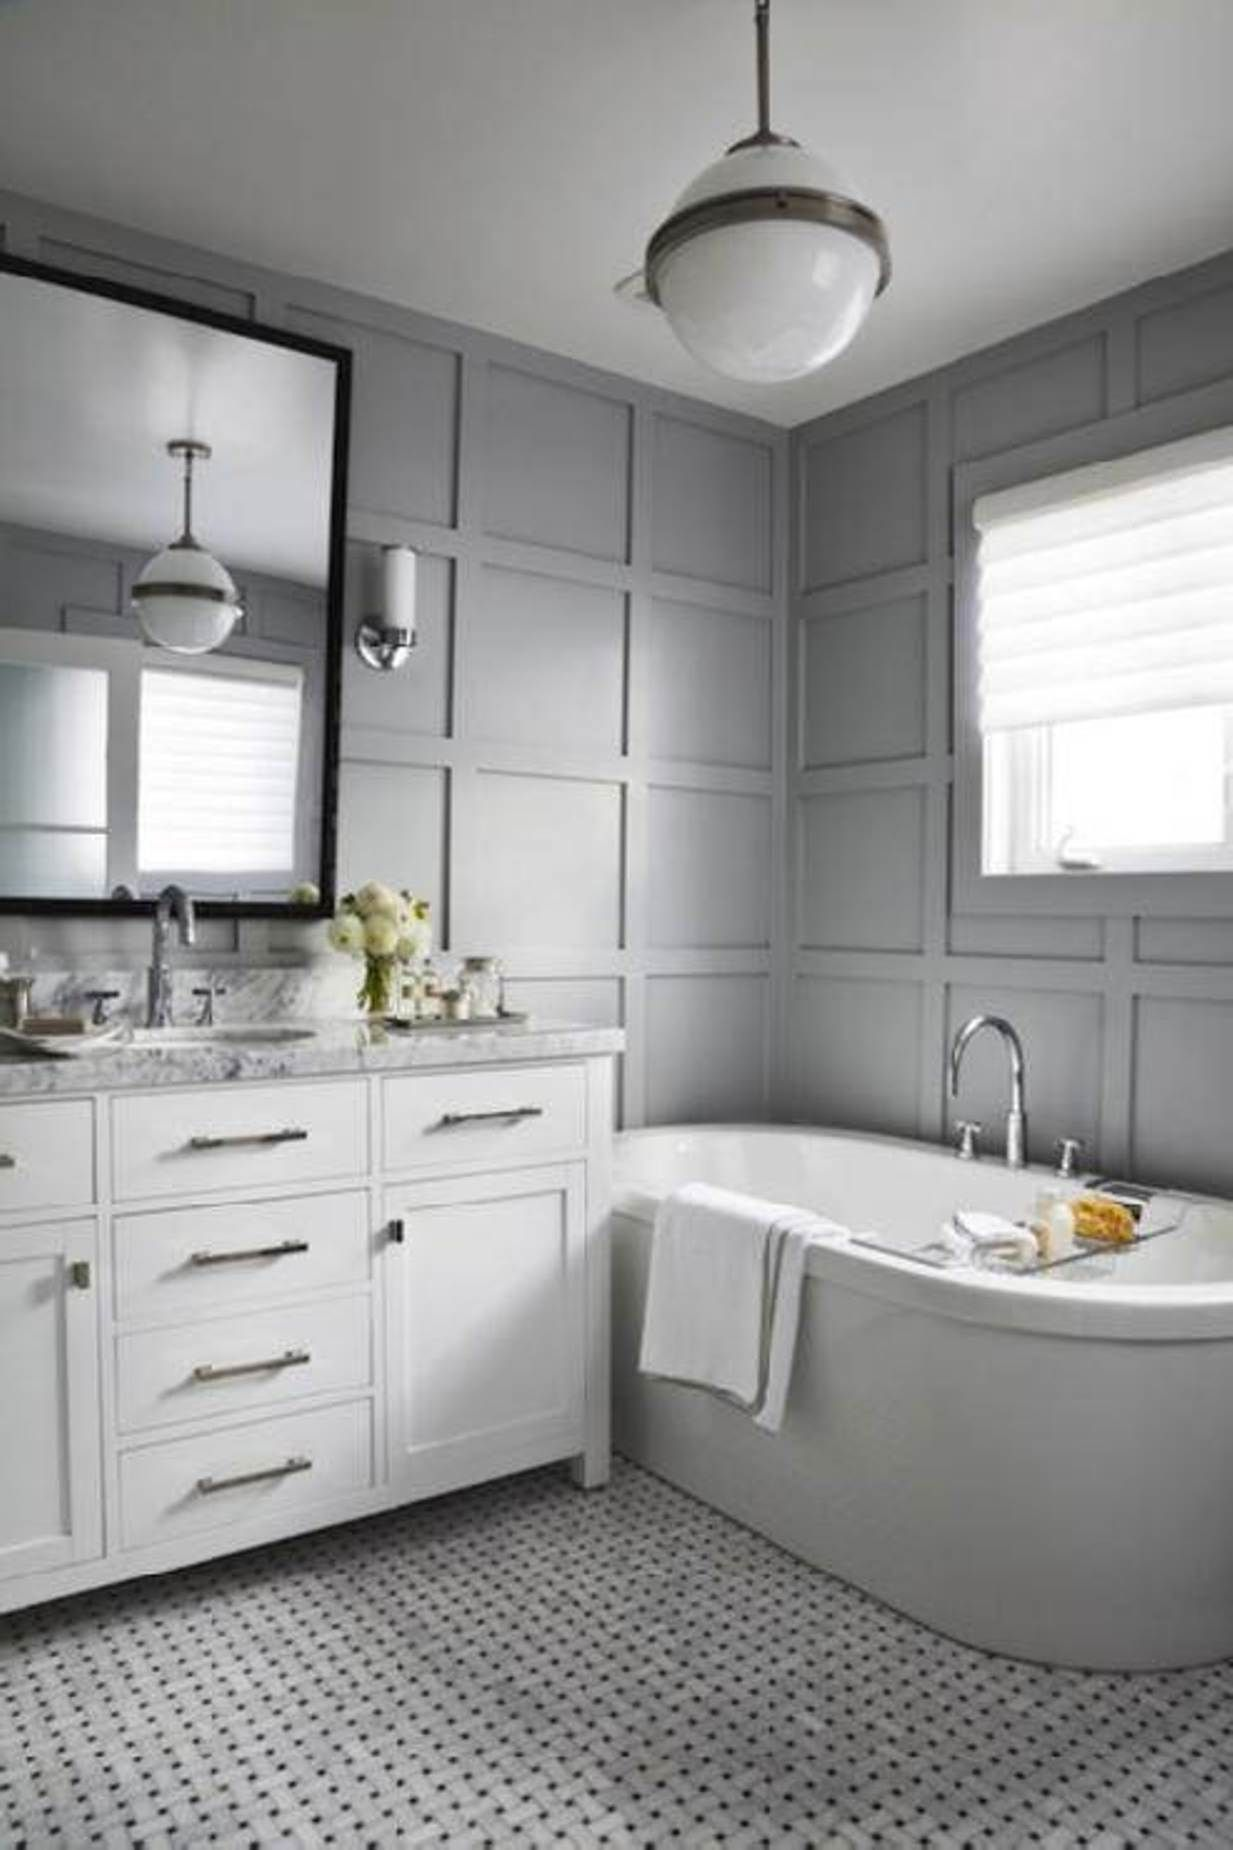 Small Space Bathroom Design Ideas | Small space bathroom ...